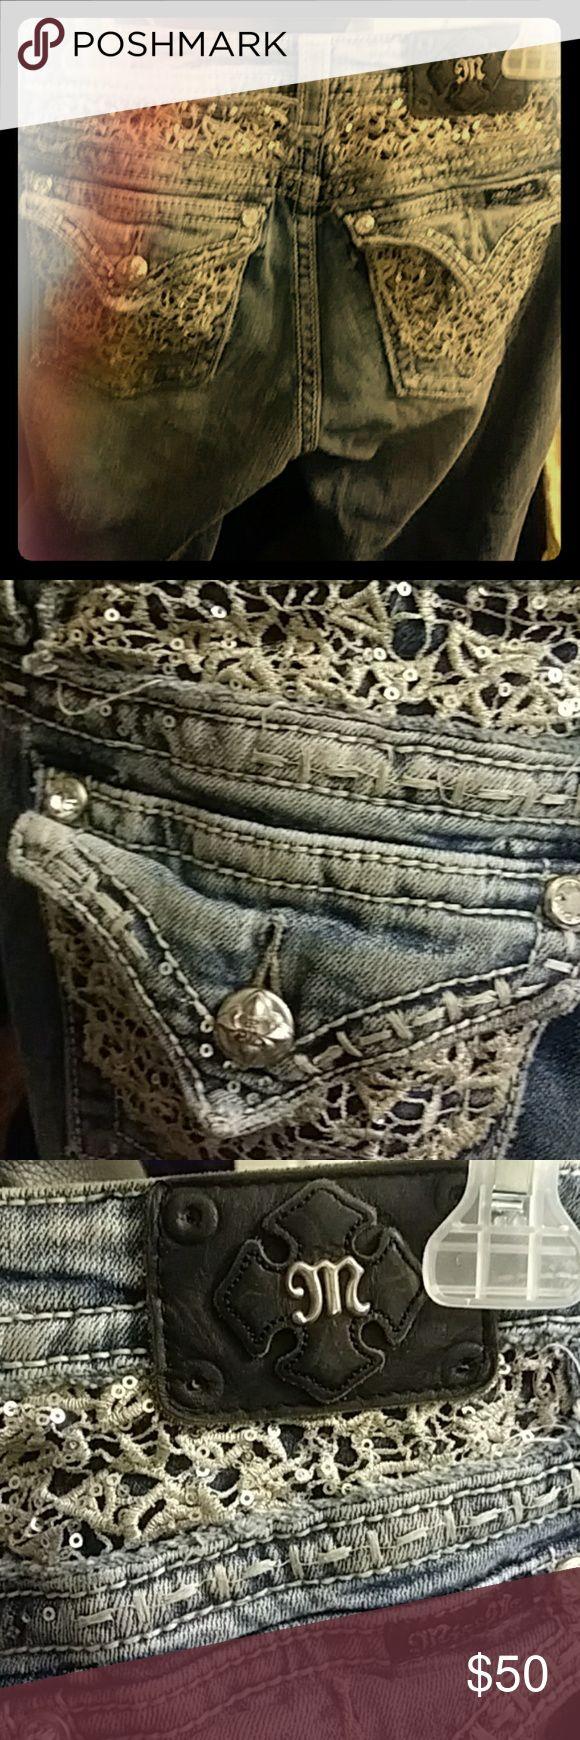 Miss Me size 27 cropped jeans Miss Me blue jean cropped pants Miss Me Jeans Ankle & Cropped